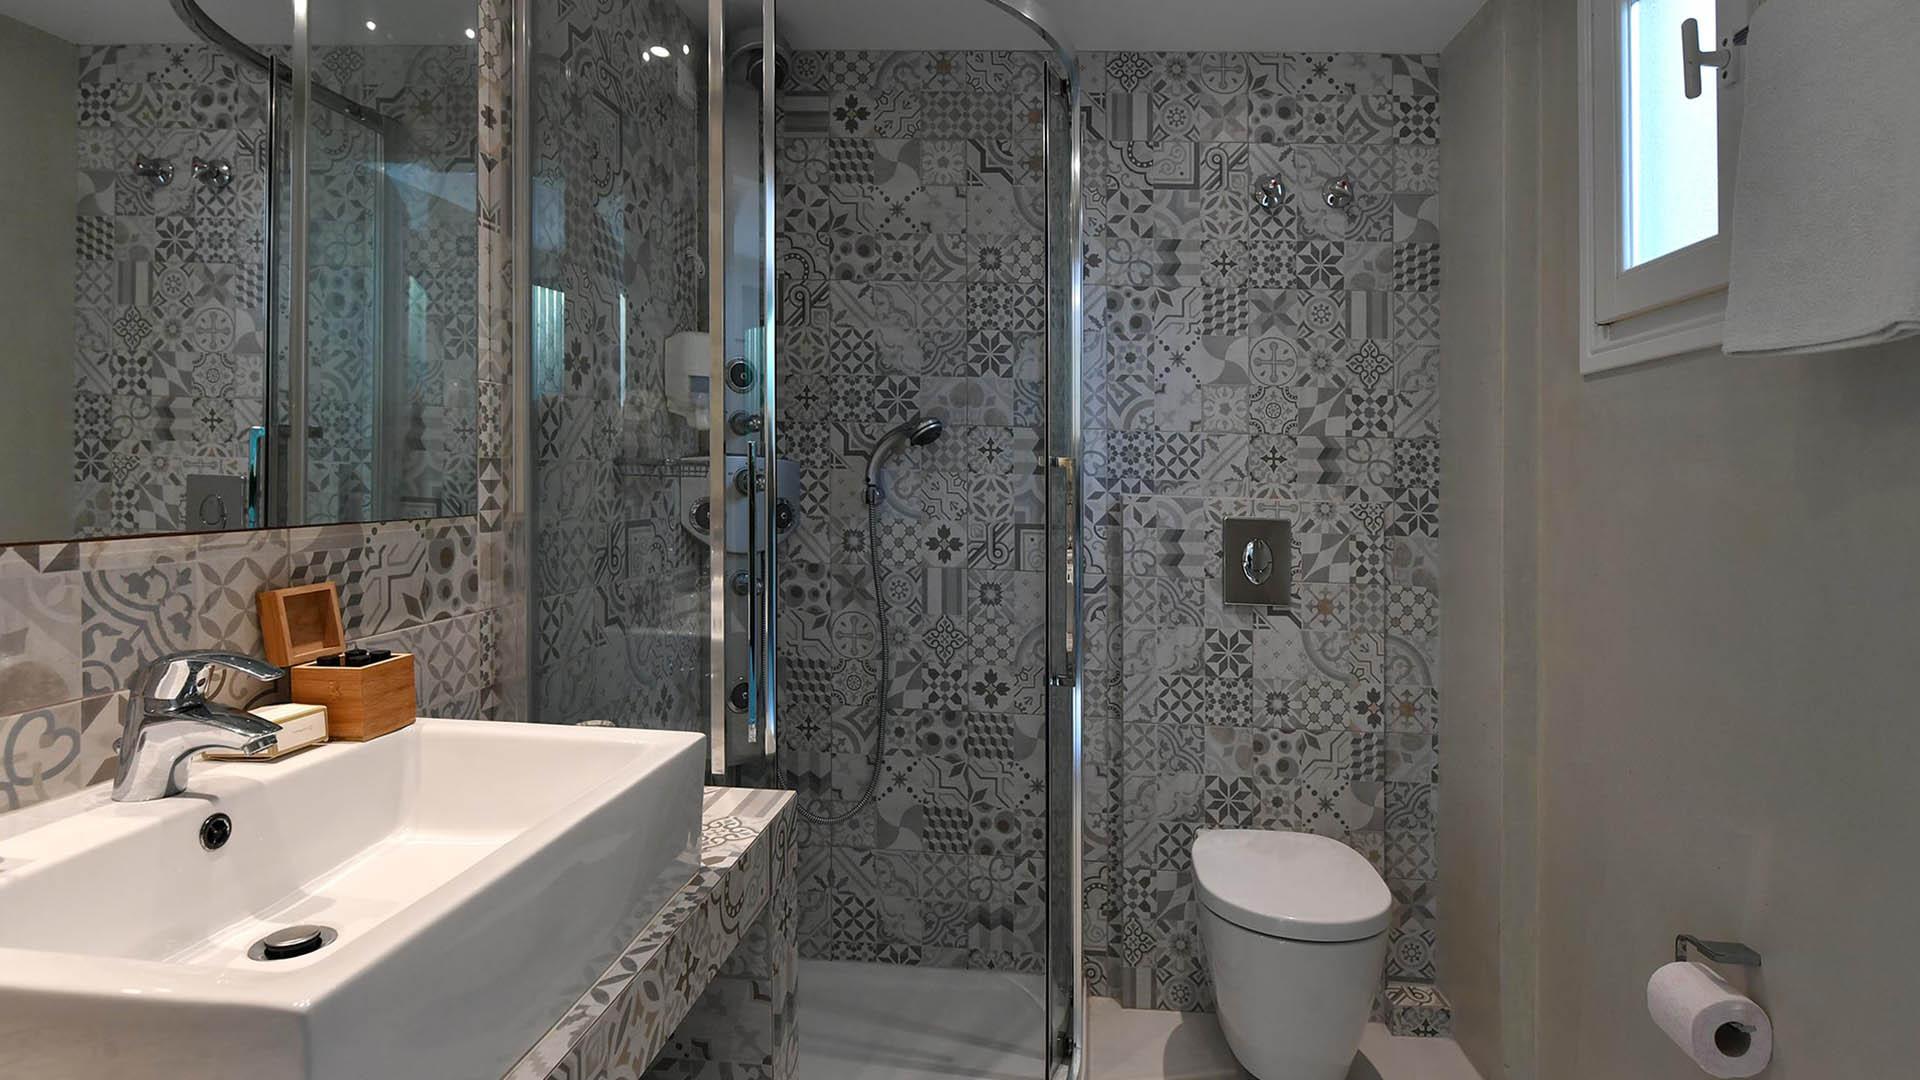 Kalypso Hotel – Suites 2 4 (6)